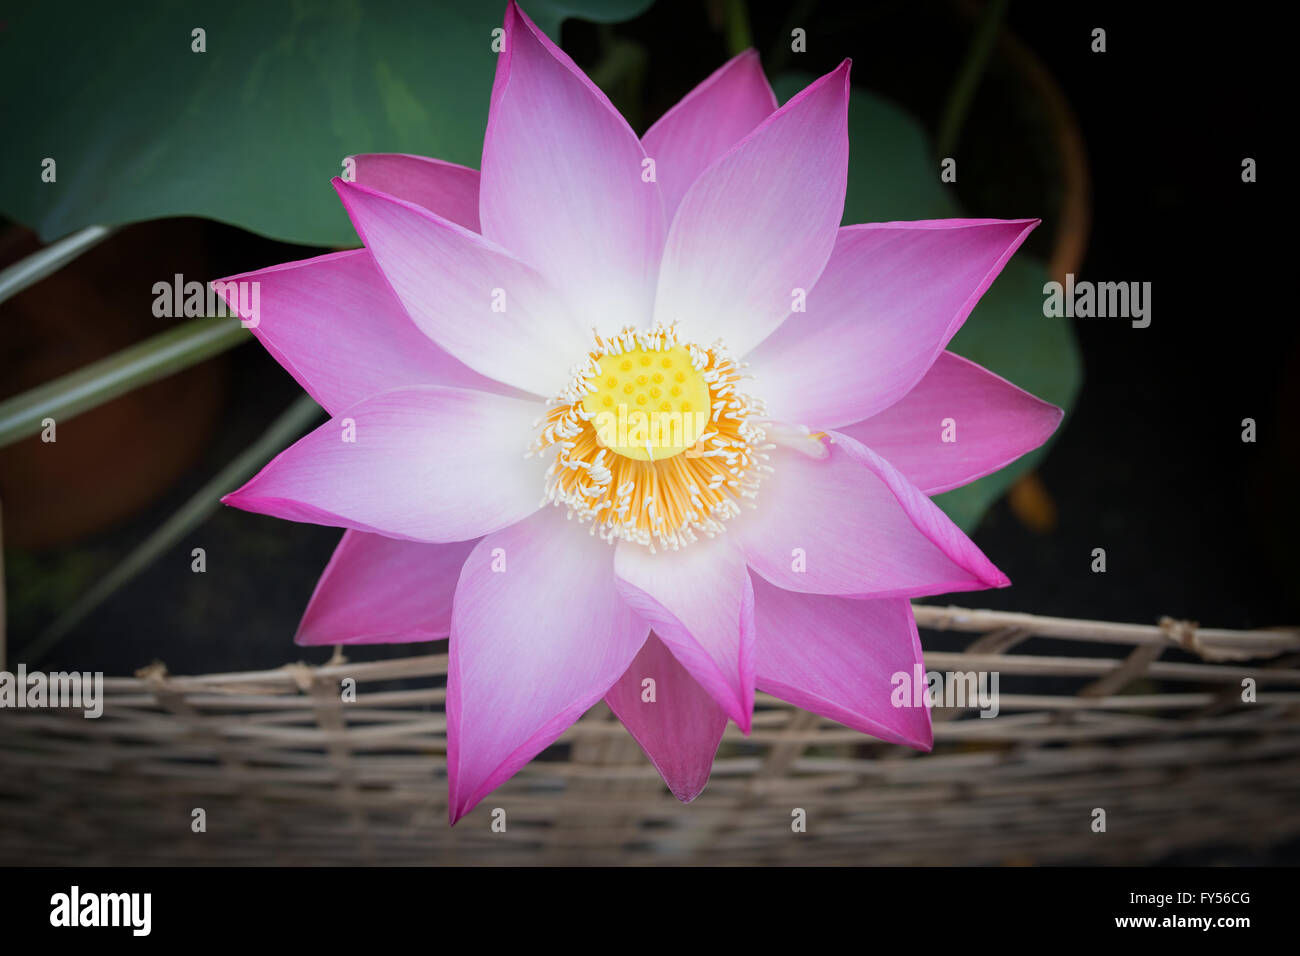 Beautiful lotus flower bloom stock photo 102762368 alamy beautiful lotus flower bloom izmirmasajfo Images